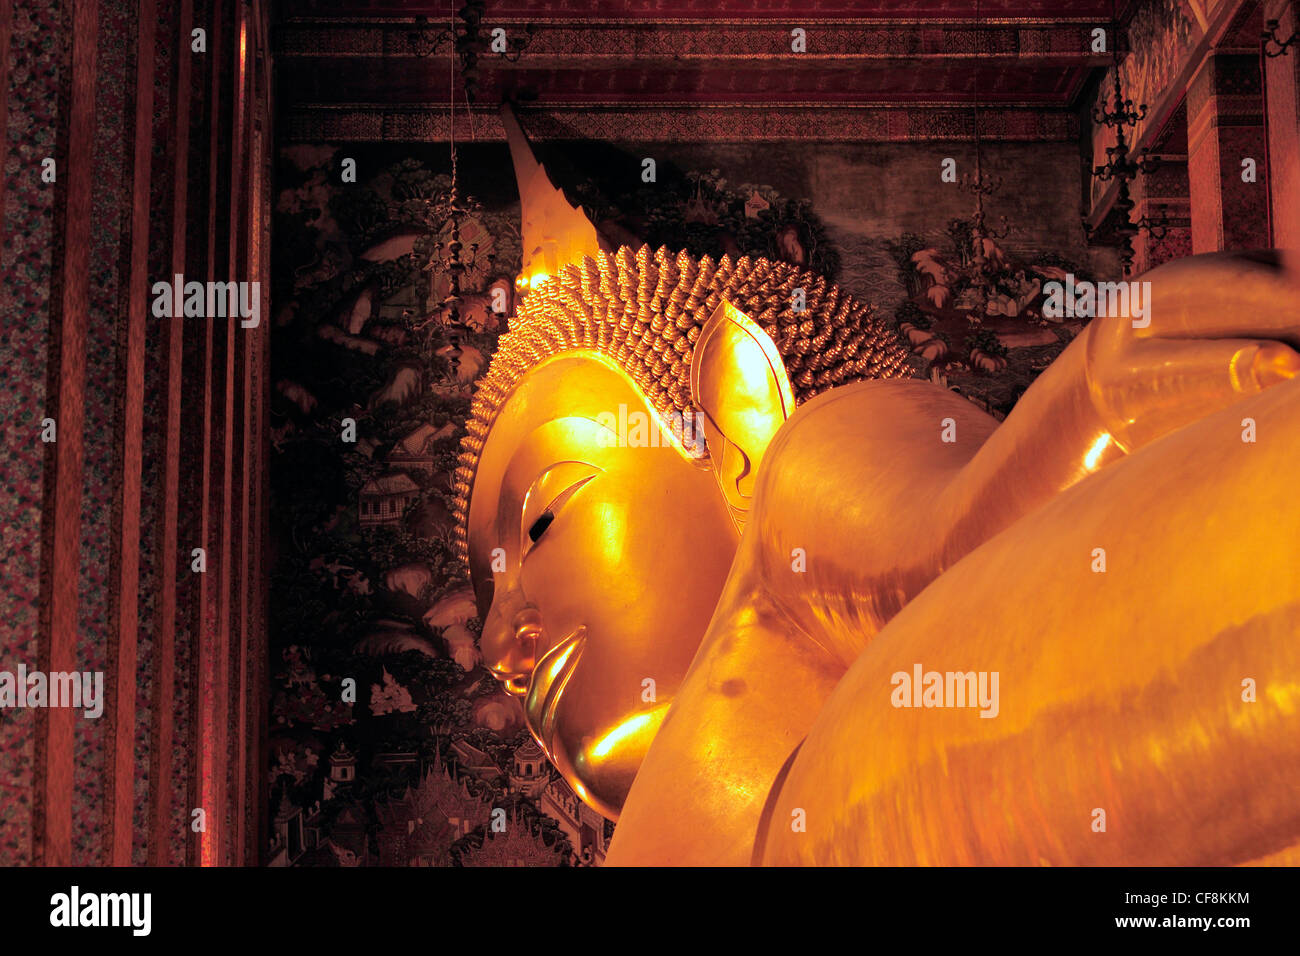 Architecture, building, Art, Asia, Asian, Thailand, Thai, South East Asia, travel, destinations, Wat Pho, Wat Pho - Stock Image